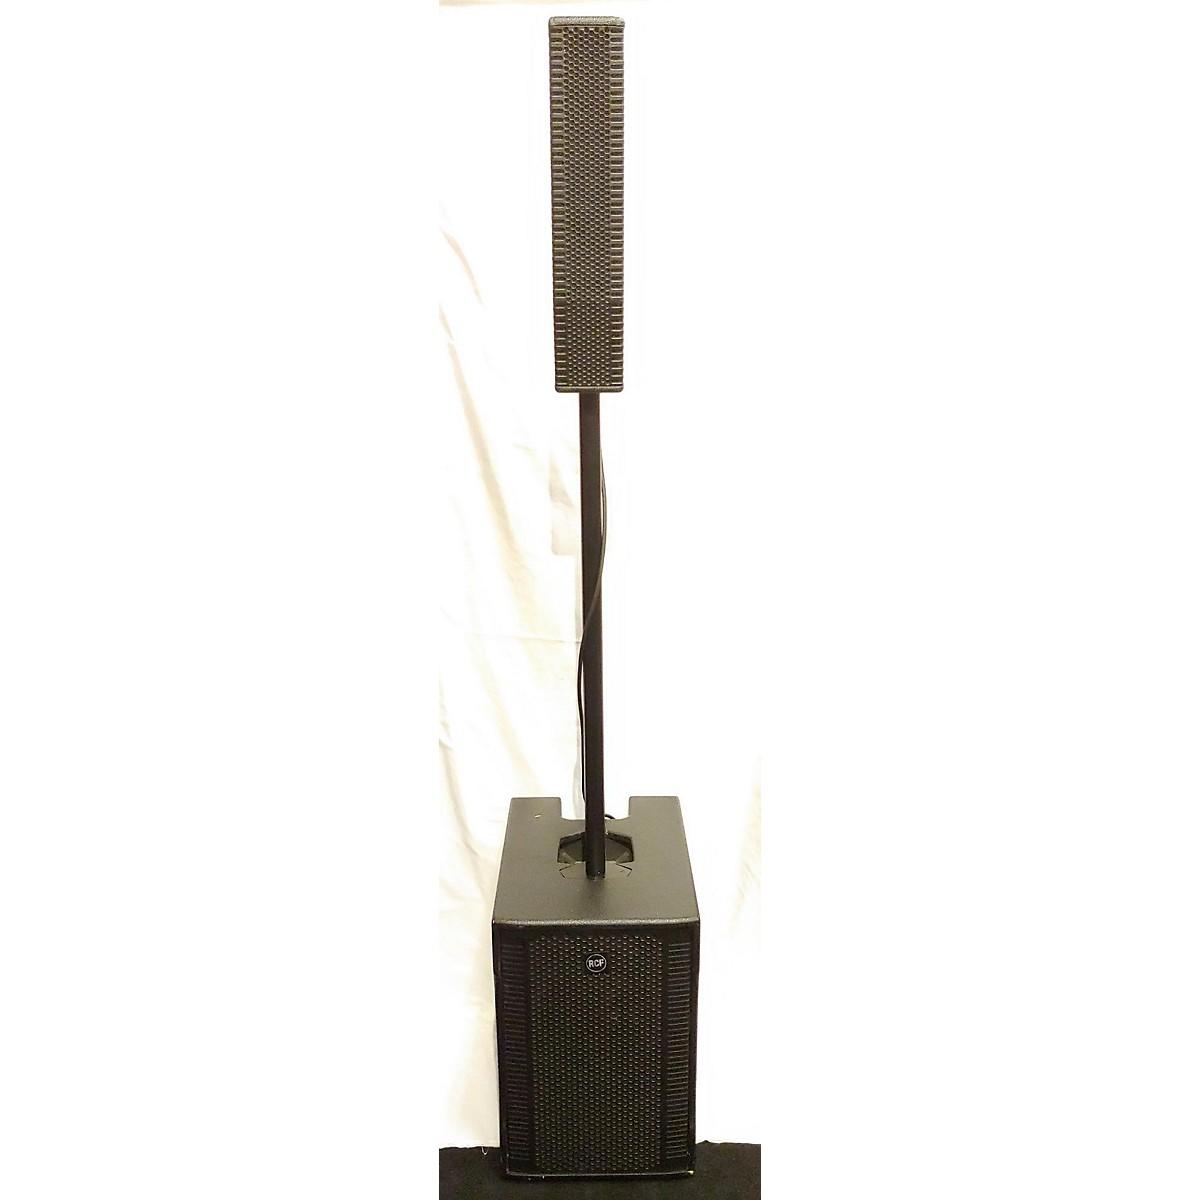 RCF EVOX8 Powered Speaker